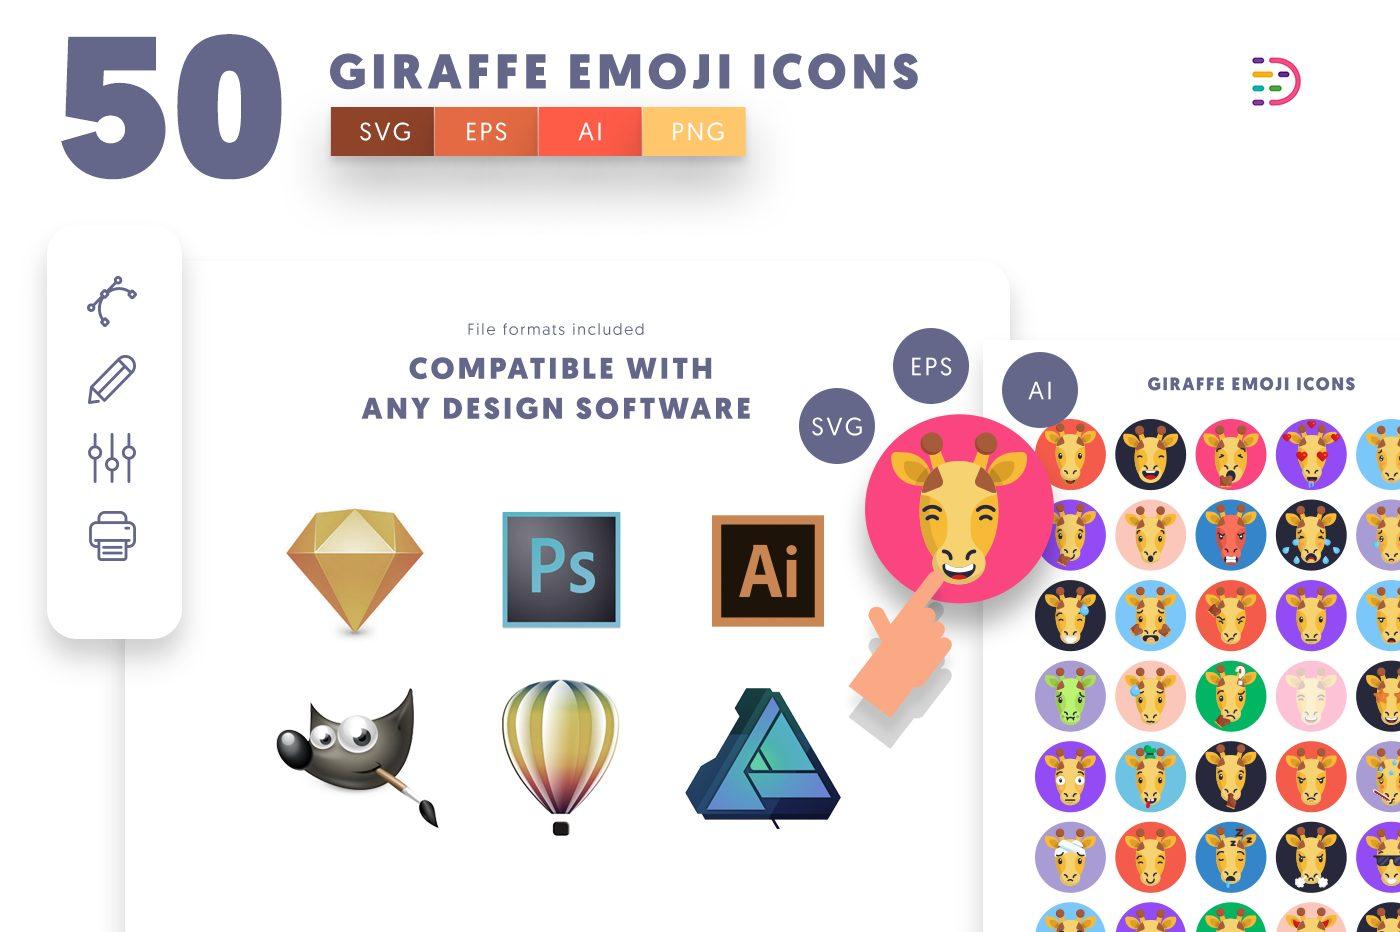 full vector 50 Giraffe Emoji Icons EPS, SVG, PNG